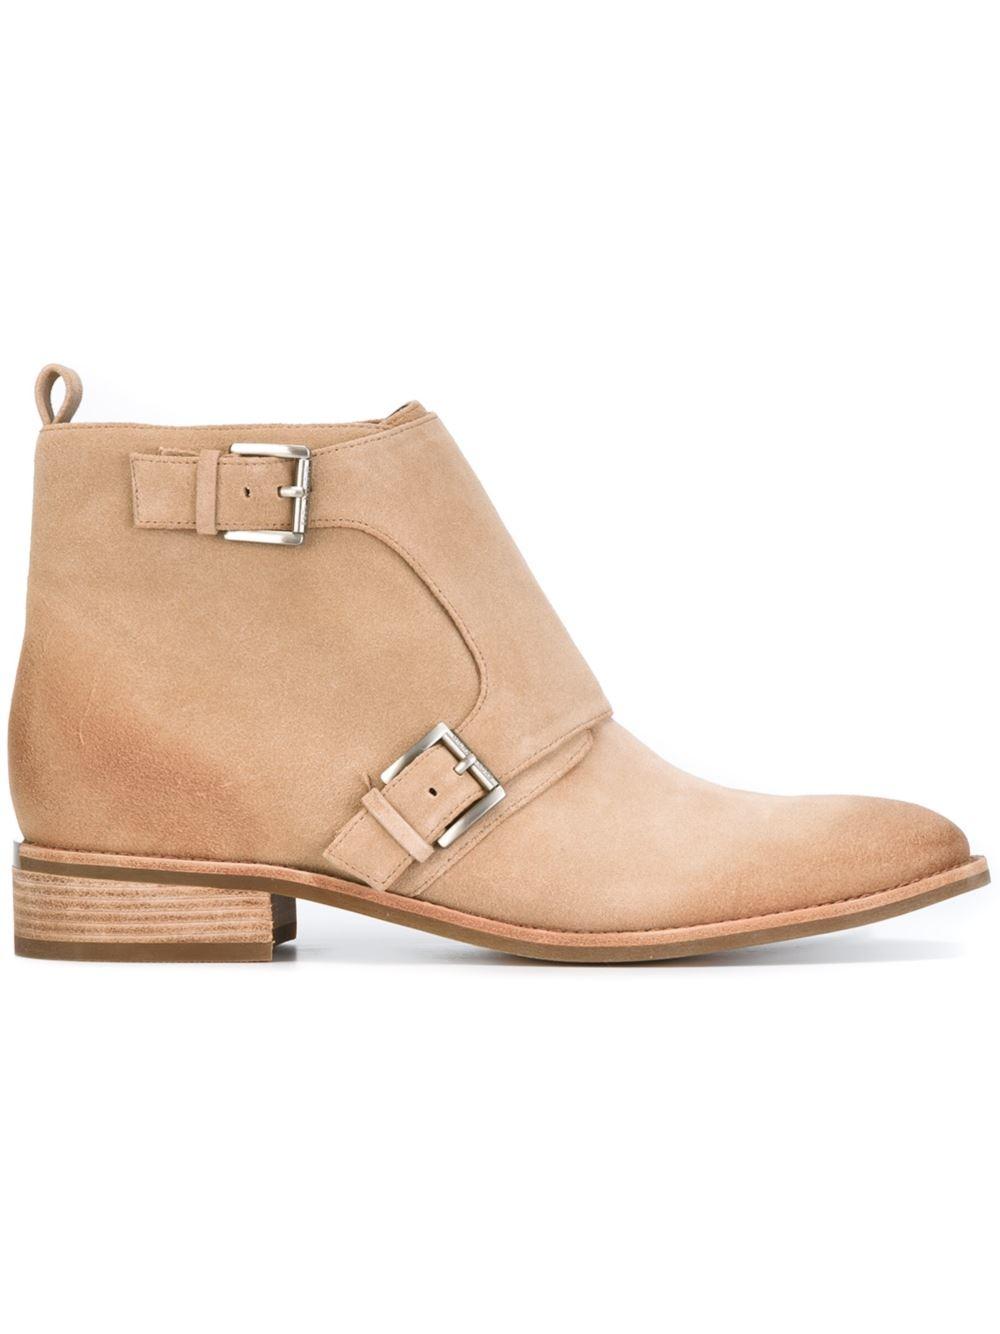 Michael Michael Kors Adams Ankle Boots Women